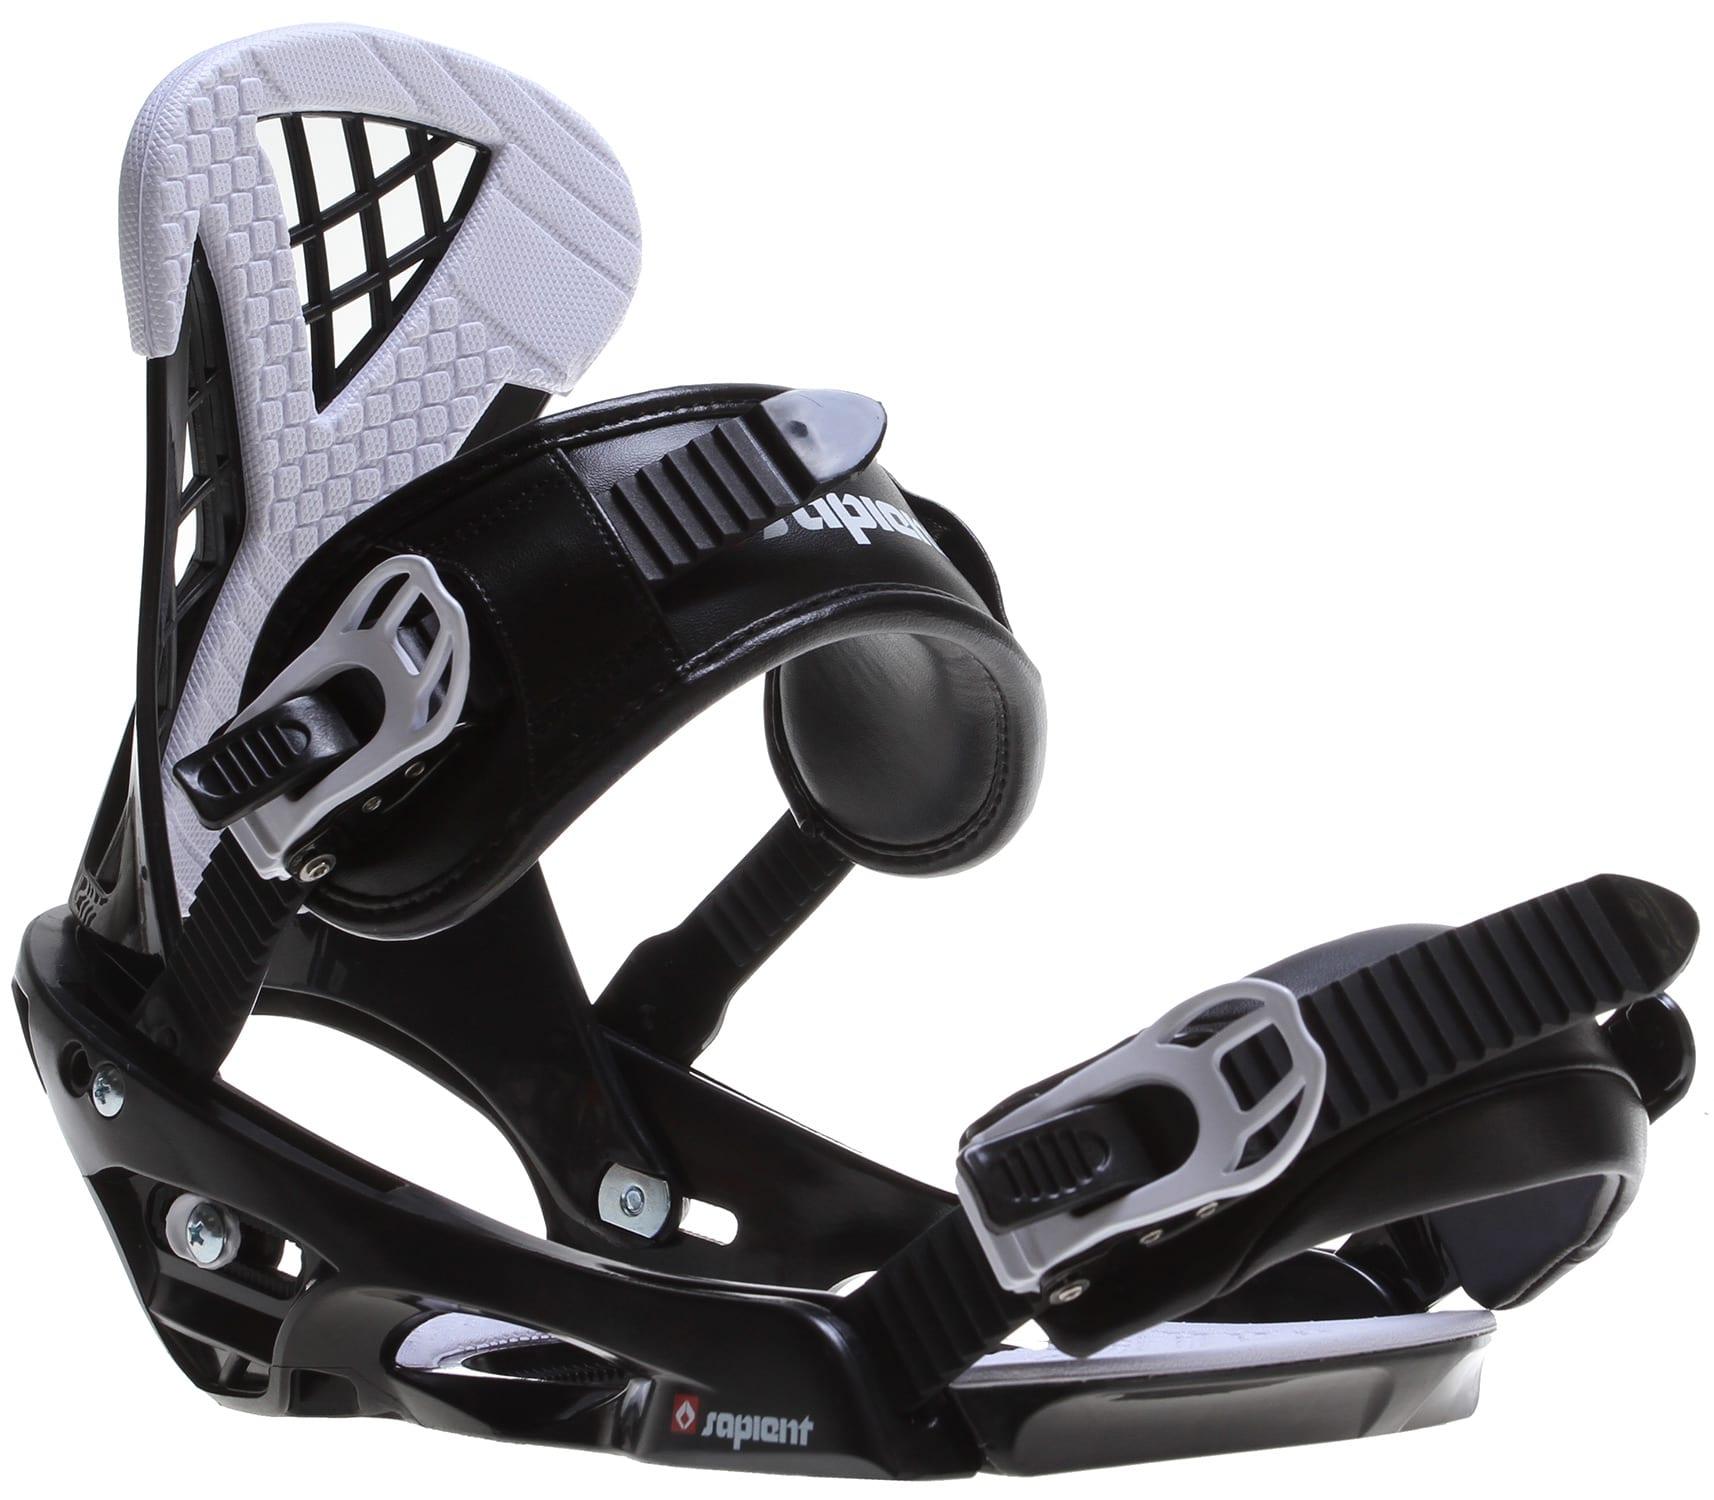 Sapient Wisdom Snowboard Bindings Black/White Mens Sz M/L